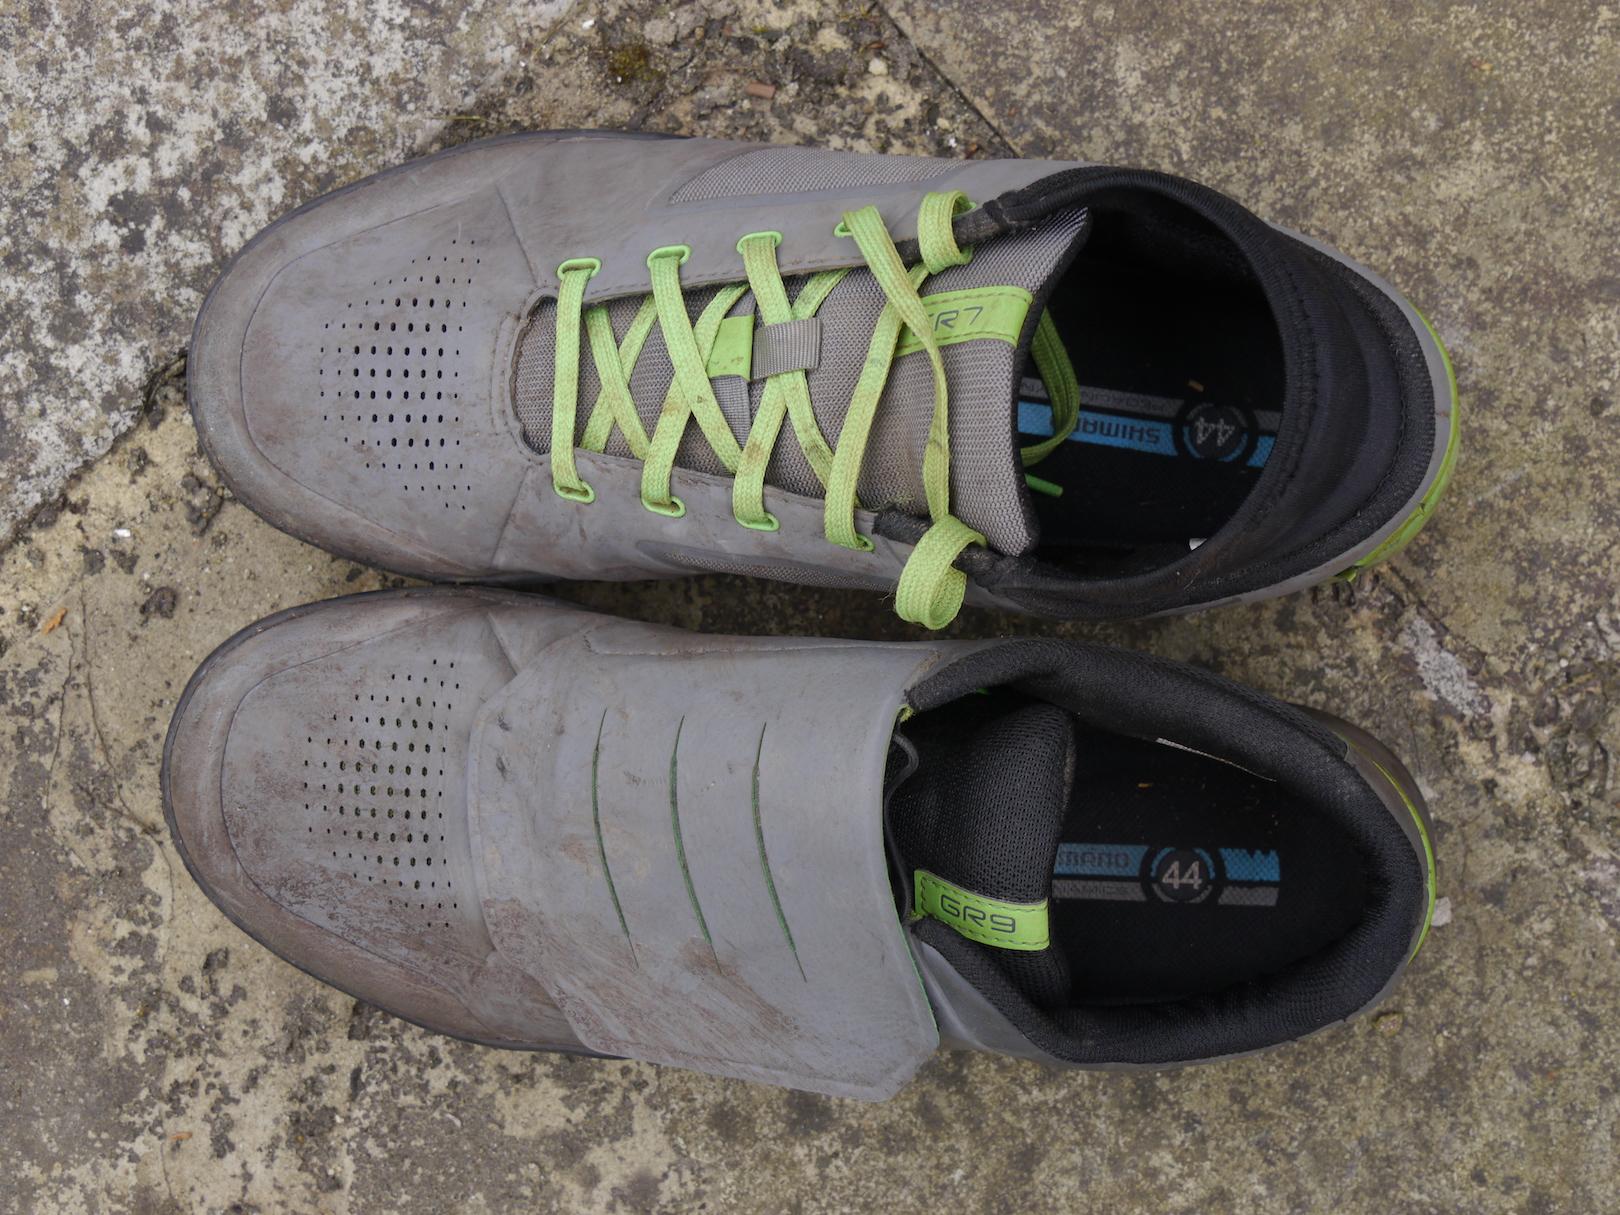 5c8fb91029f Review: Shimano GR7 vs GR9 Flat Pedal Shoes - Singletrack Magazine